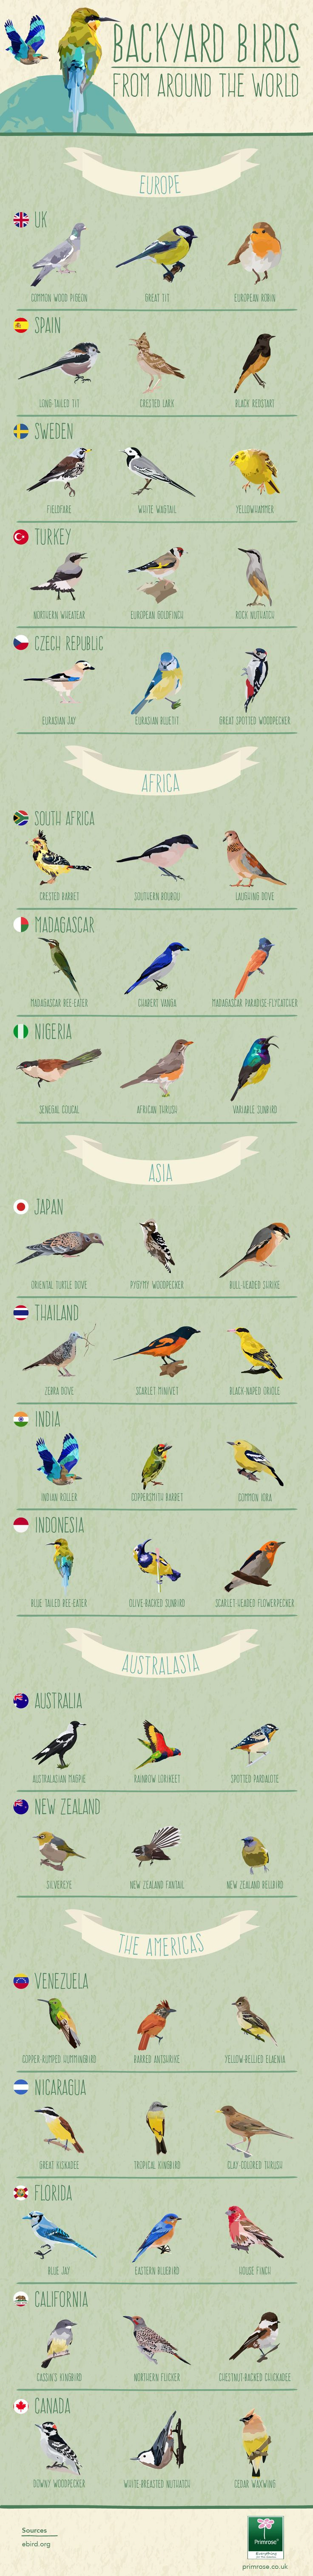 best 25 backyard birds ideas on pinterest pretty birds blue